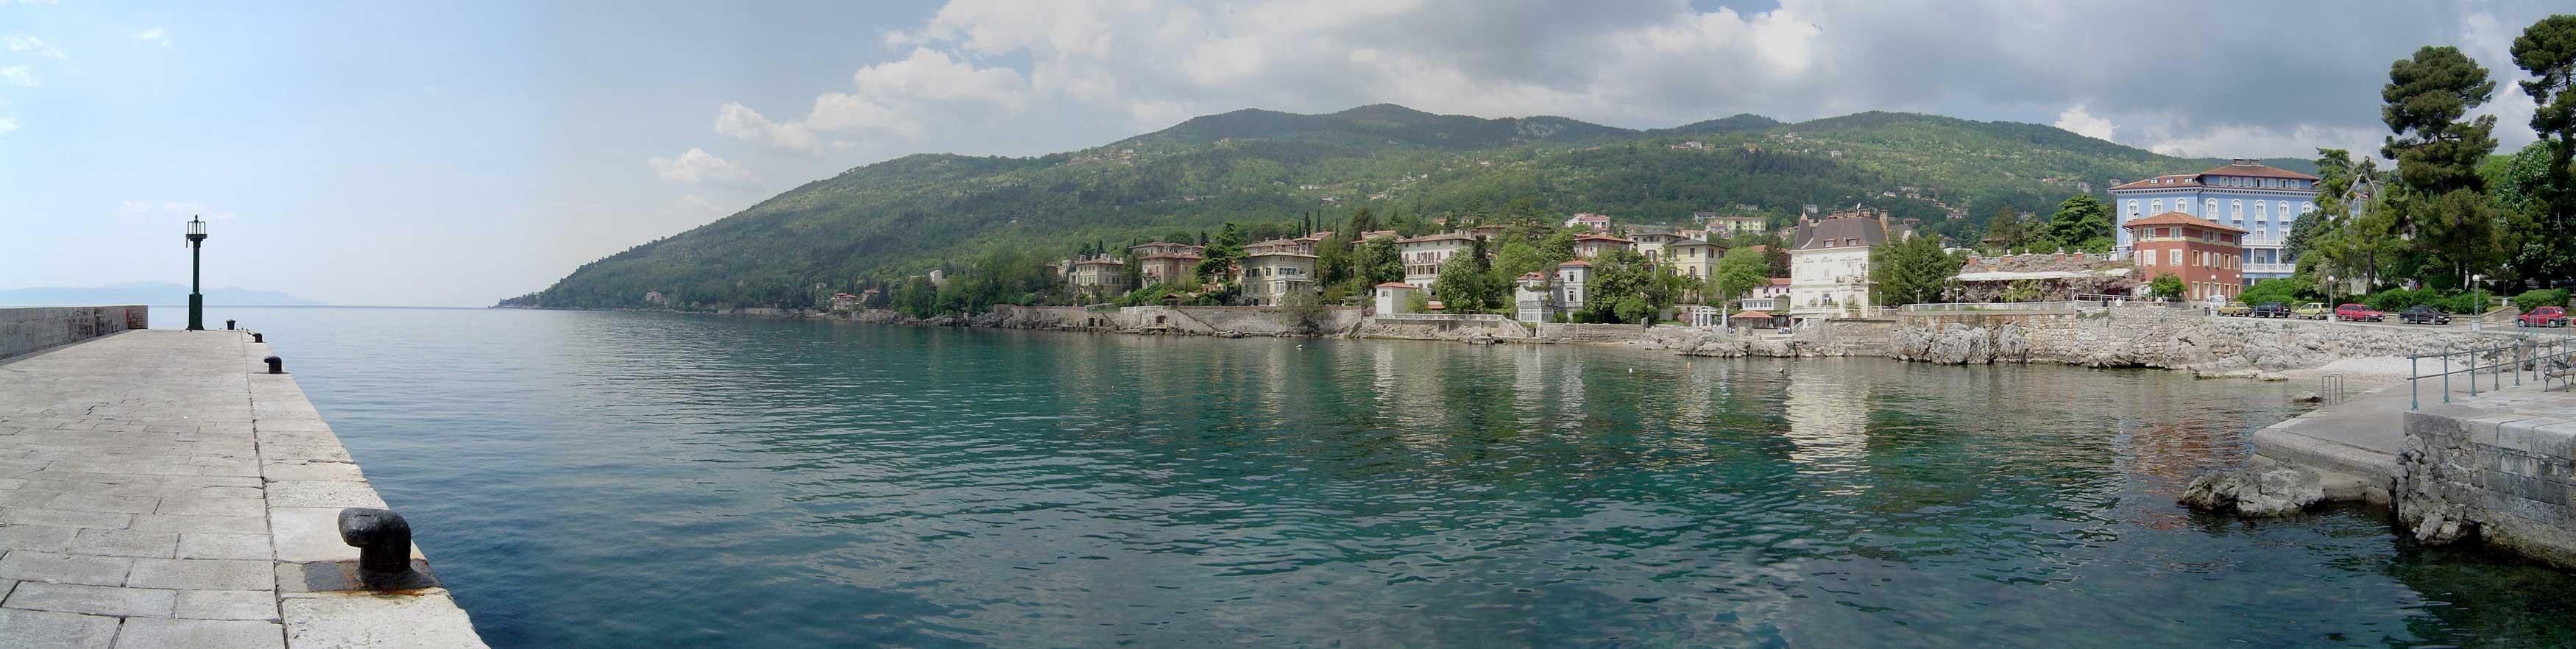 Lovran Croatia  City pictures : Croatia Part One From the Slovenia border to Split